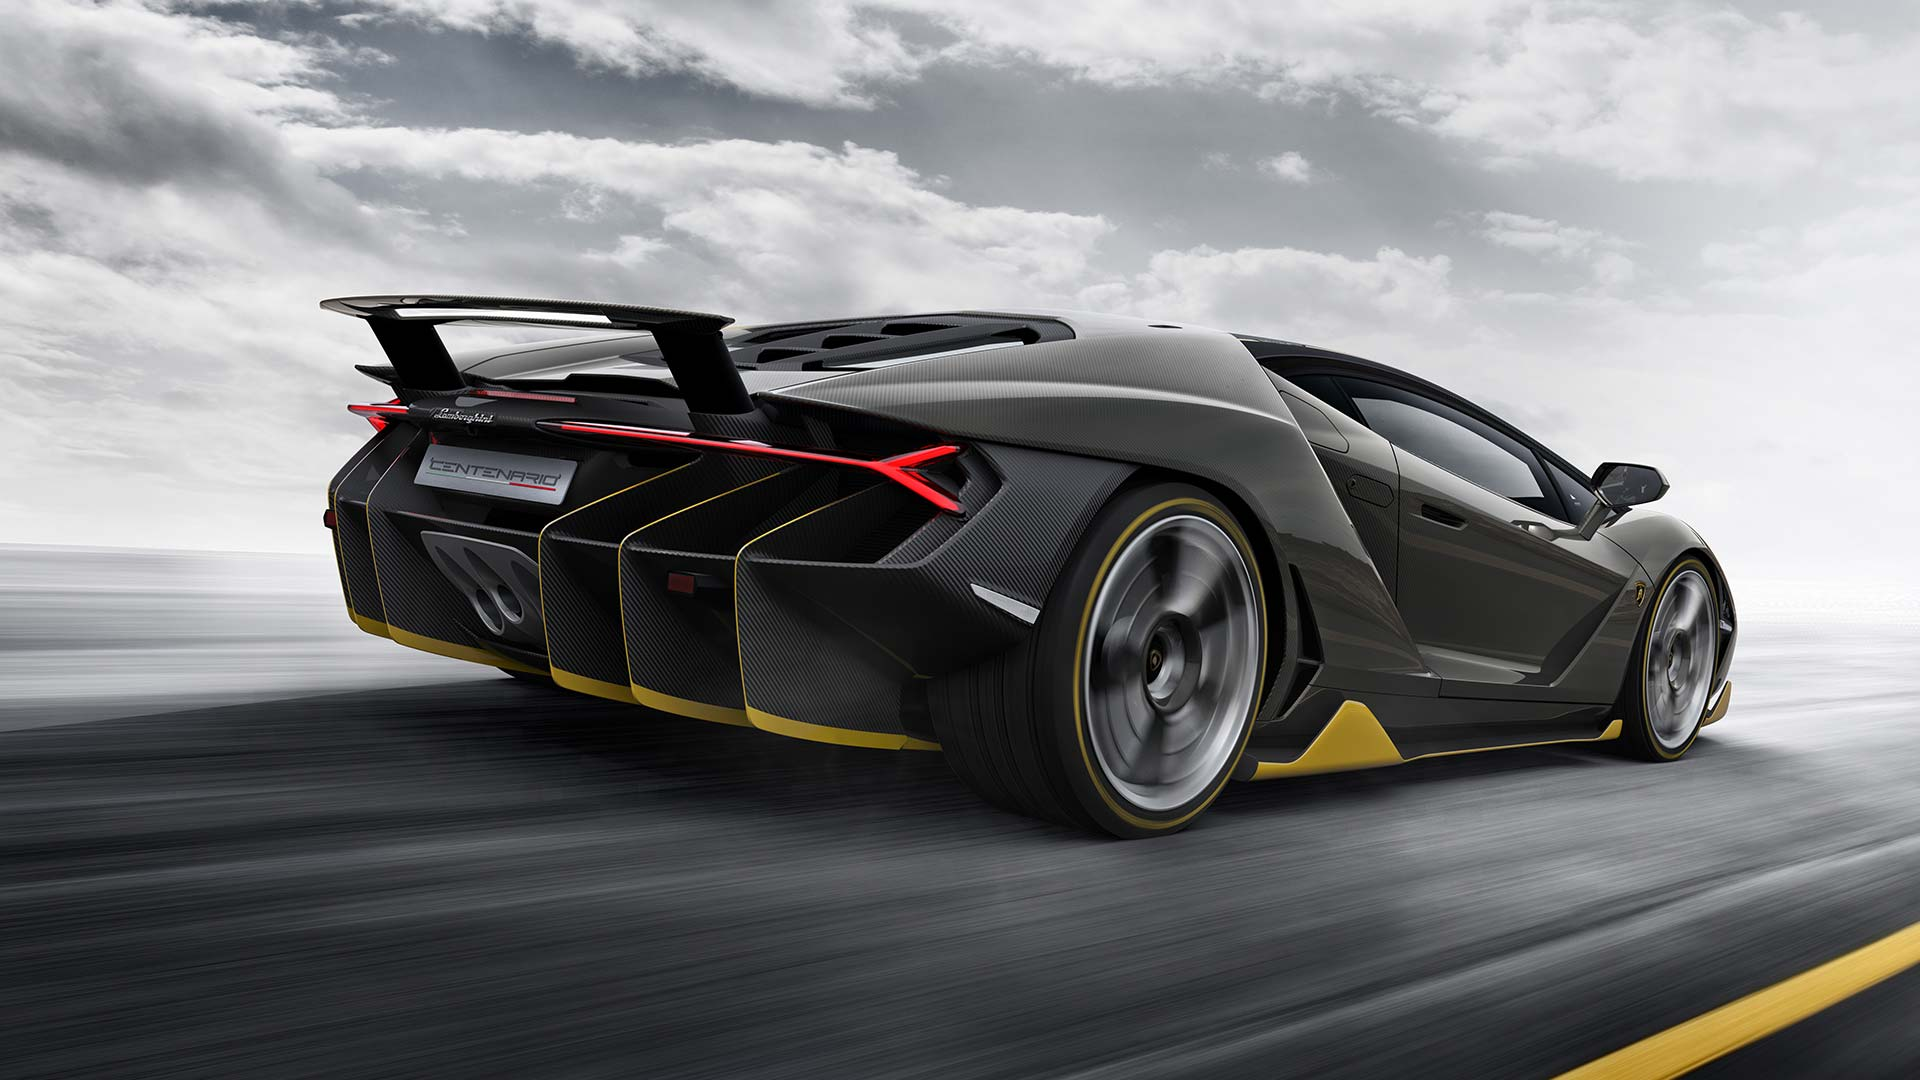 Lamborghini Centenario Car Poster Print T186 A4 A3 A2 A1 A0|